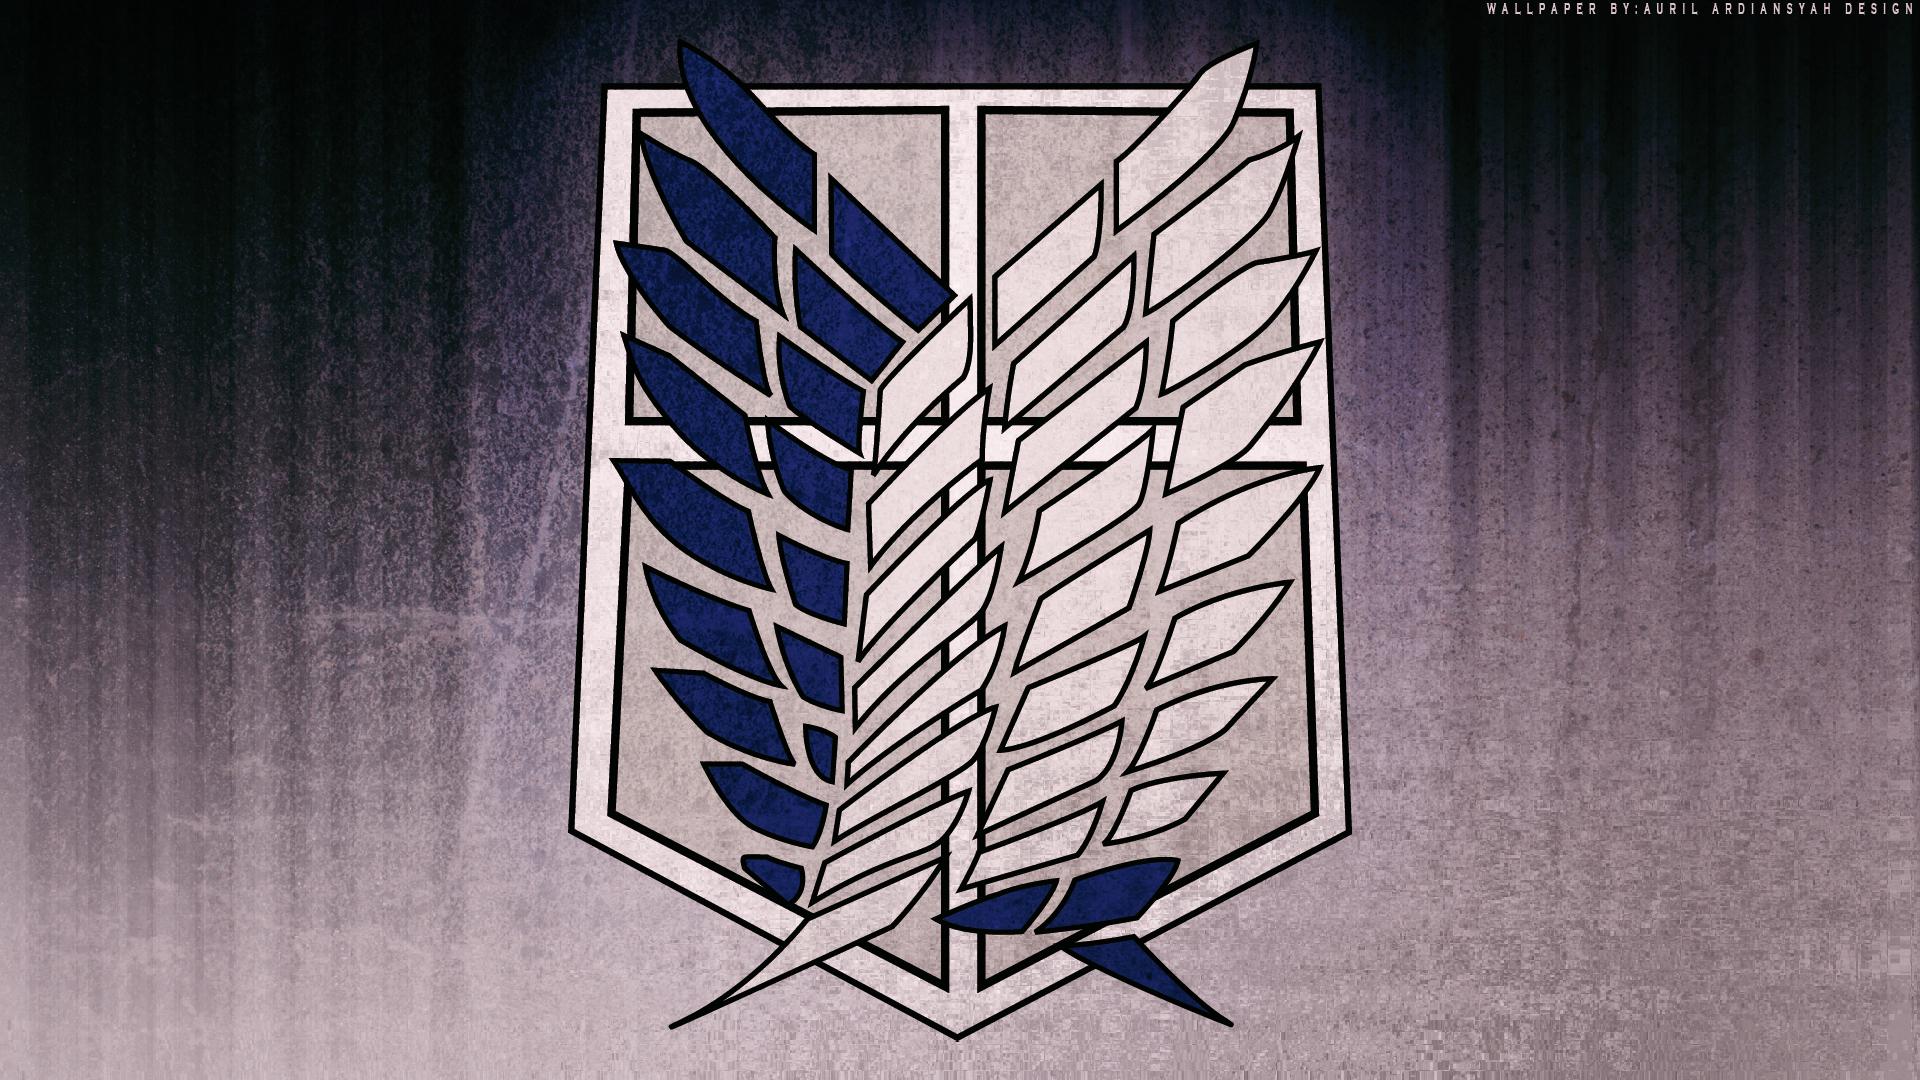 Scouting Legion Fondo De Pantalla Hd Fondo De Escritorio